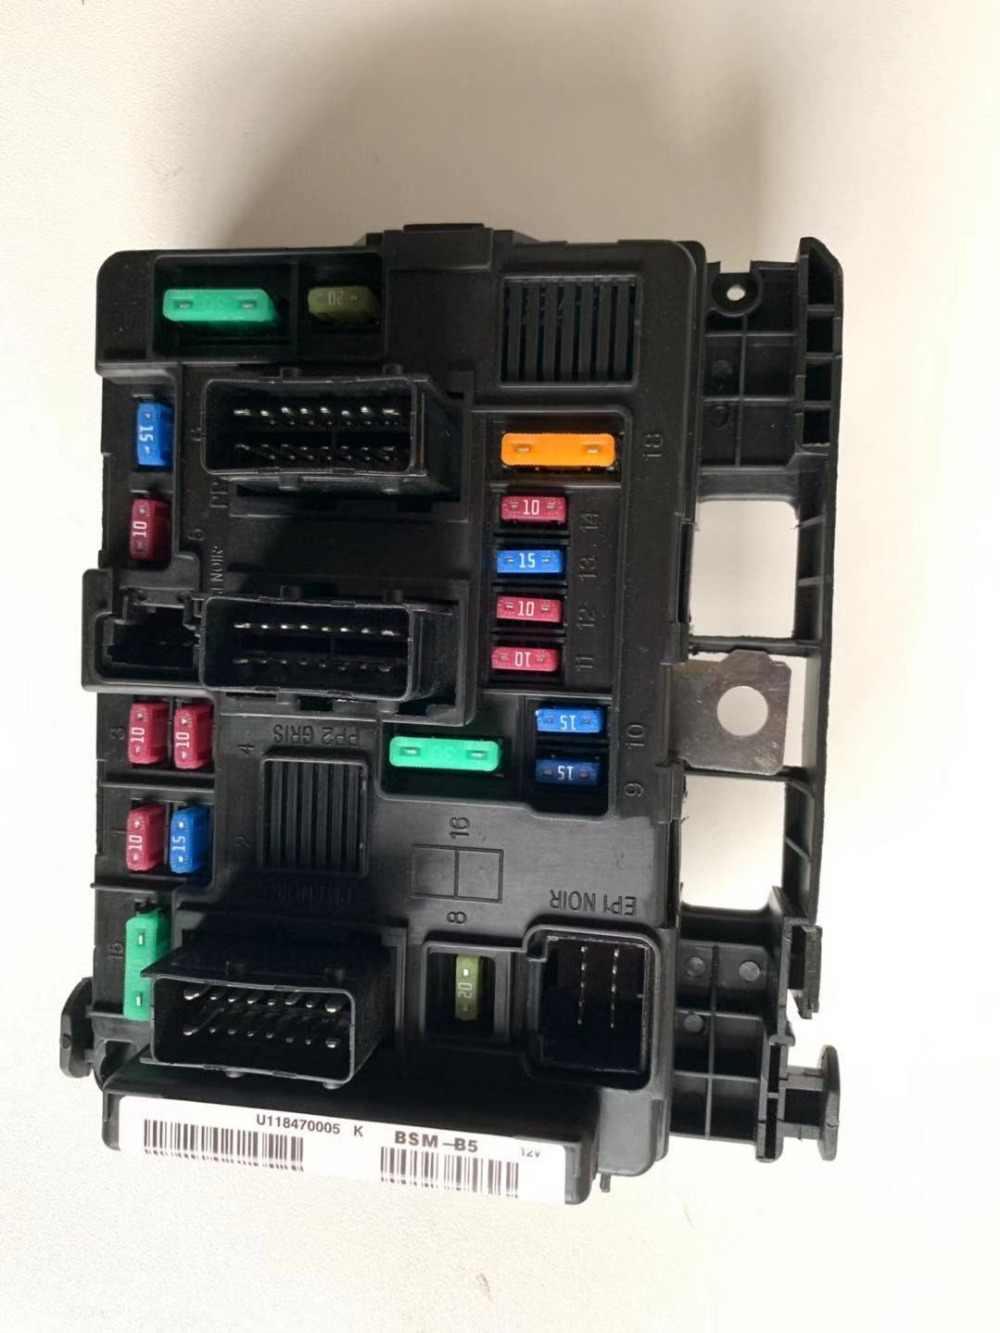 medium resolution of high quality fuse box 6500 y3 9650618280 for peugeot 1007 206 307 partner under bonnet